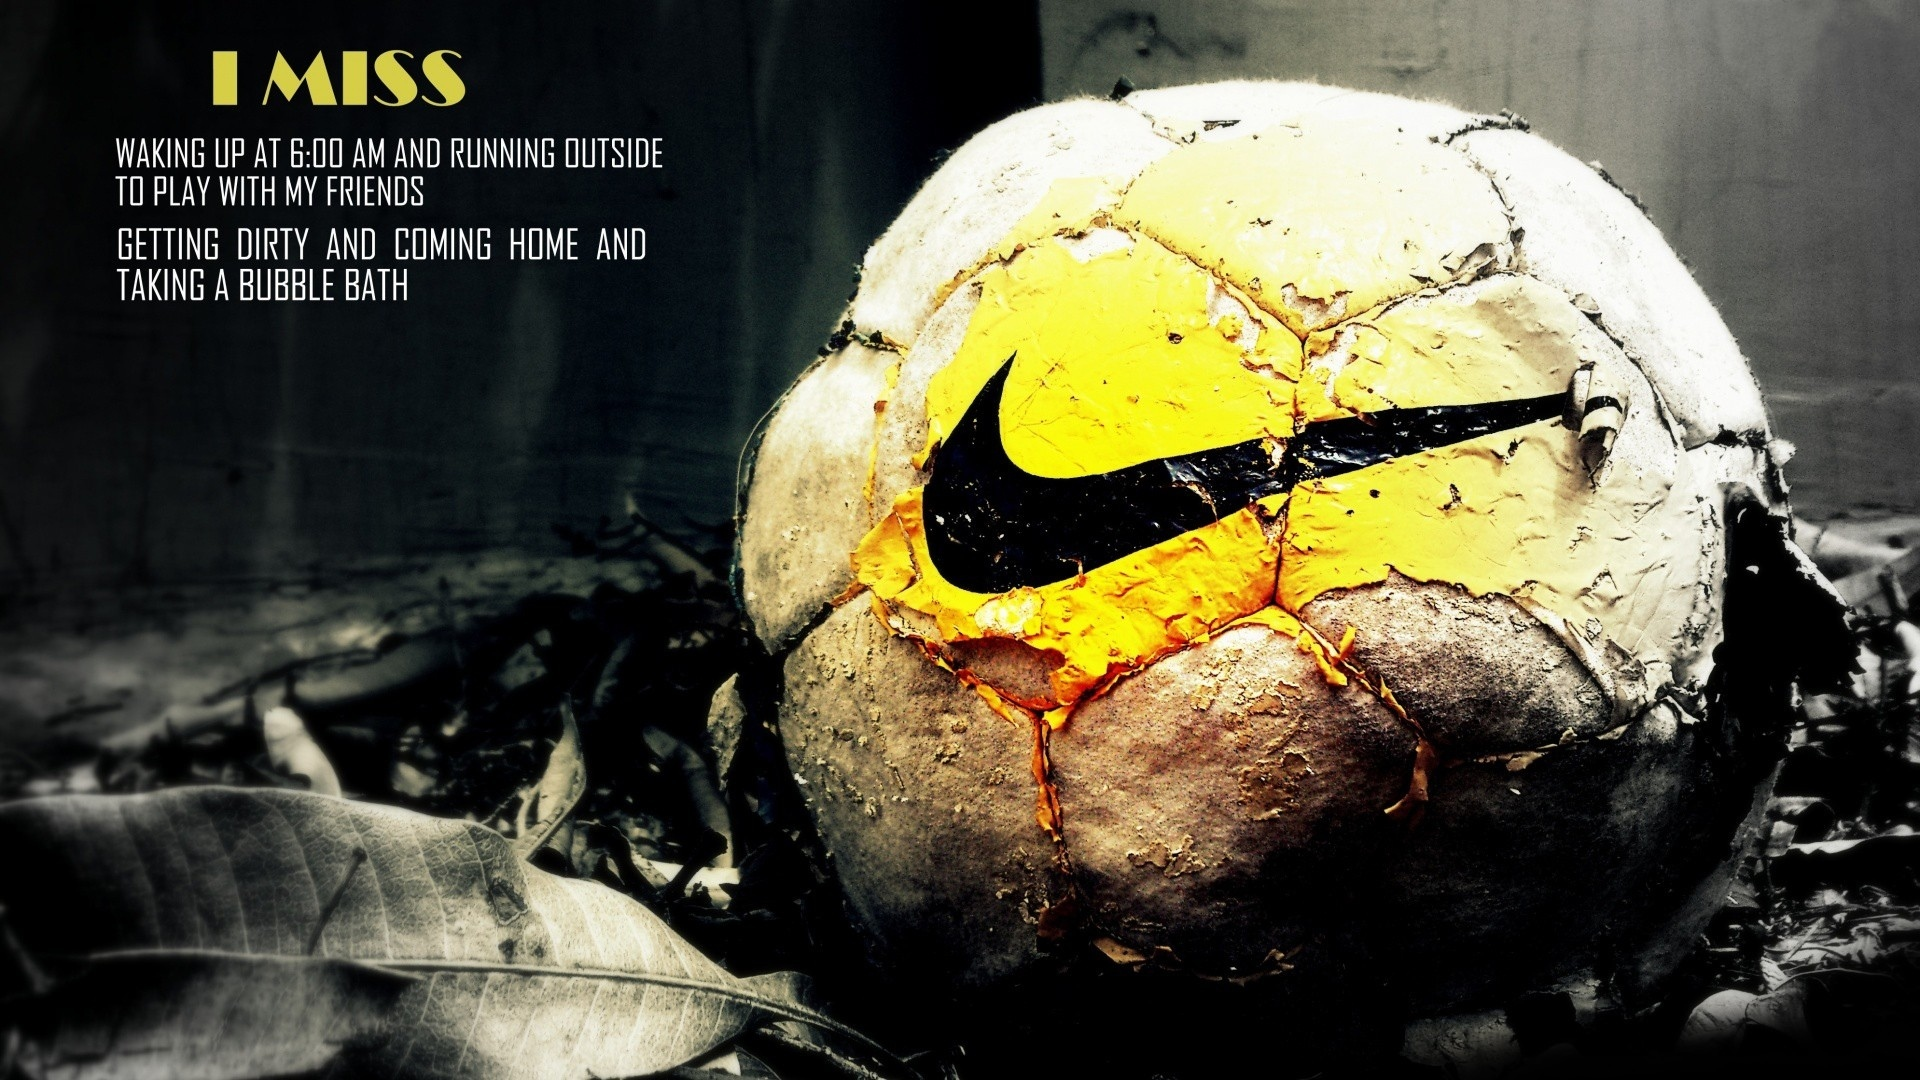 76] Nike Soccer Wallpapers on WallpaperSafari 1920x1080